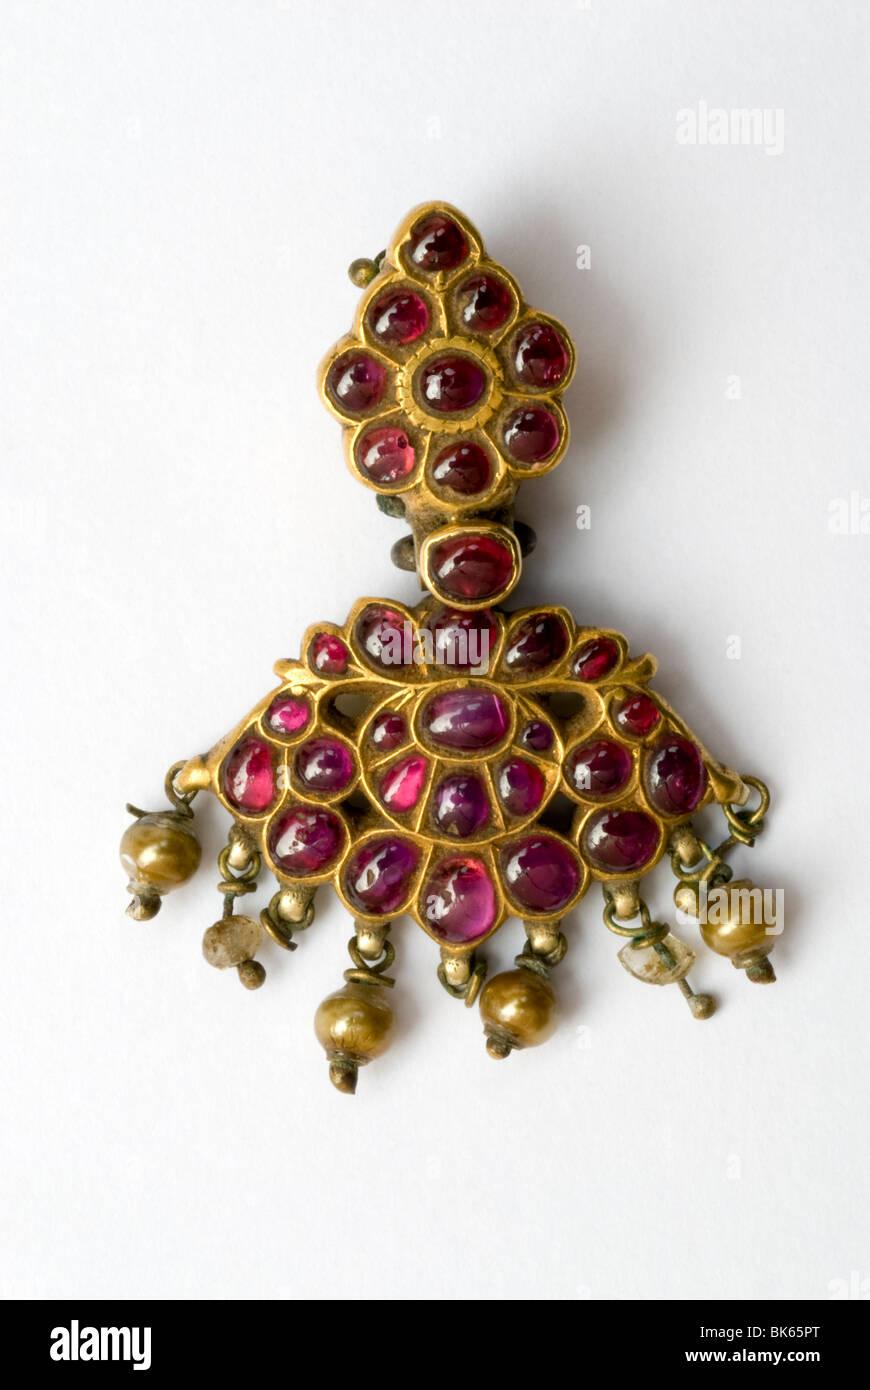 Ruby Pendant ( Attigai Pathakkam)- Gold- 120 years old, Coimbatore - Stock Image